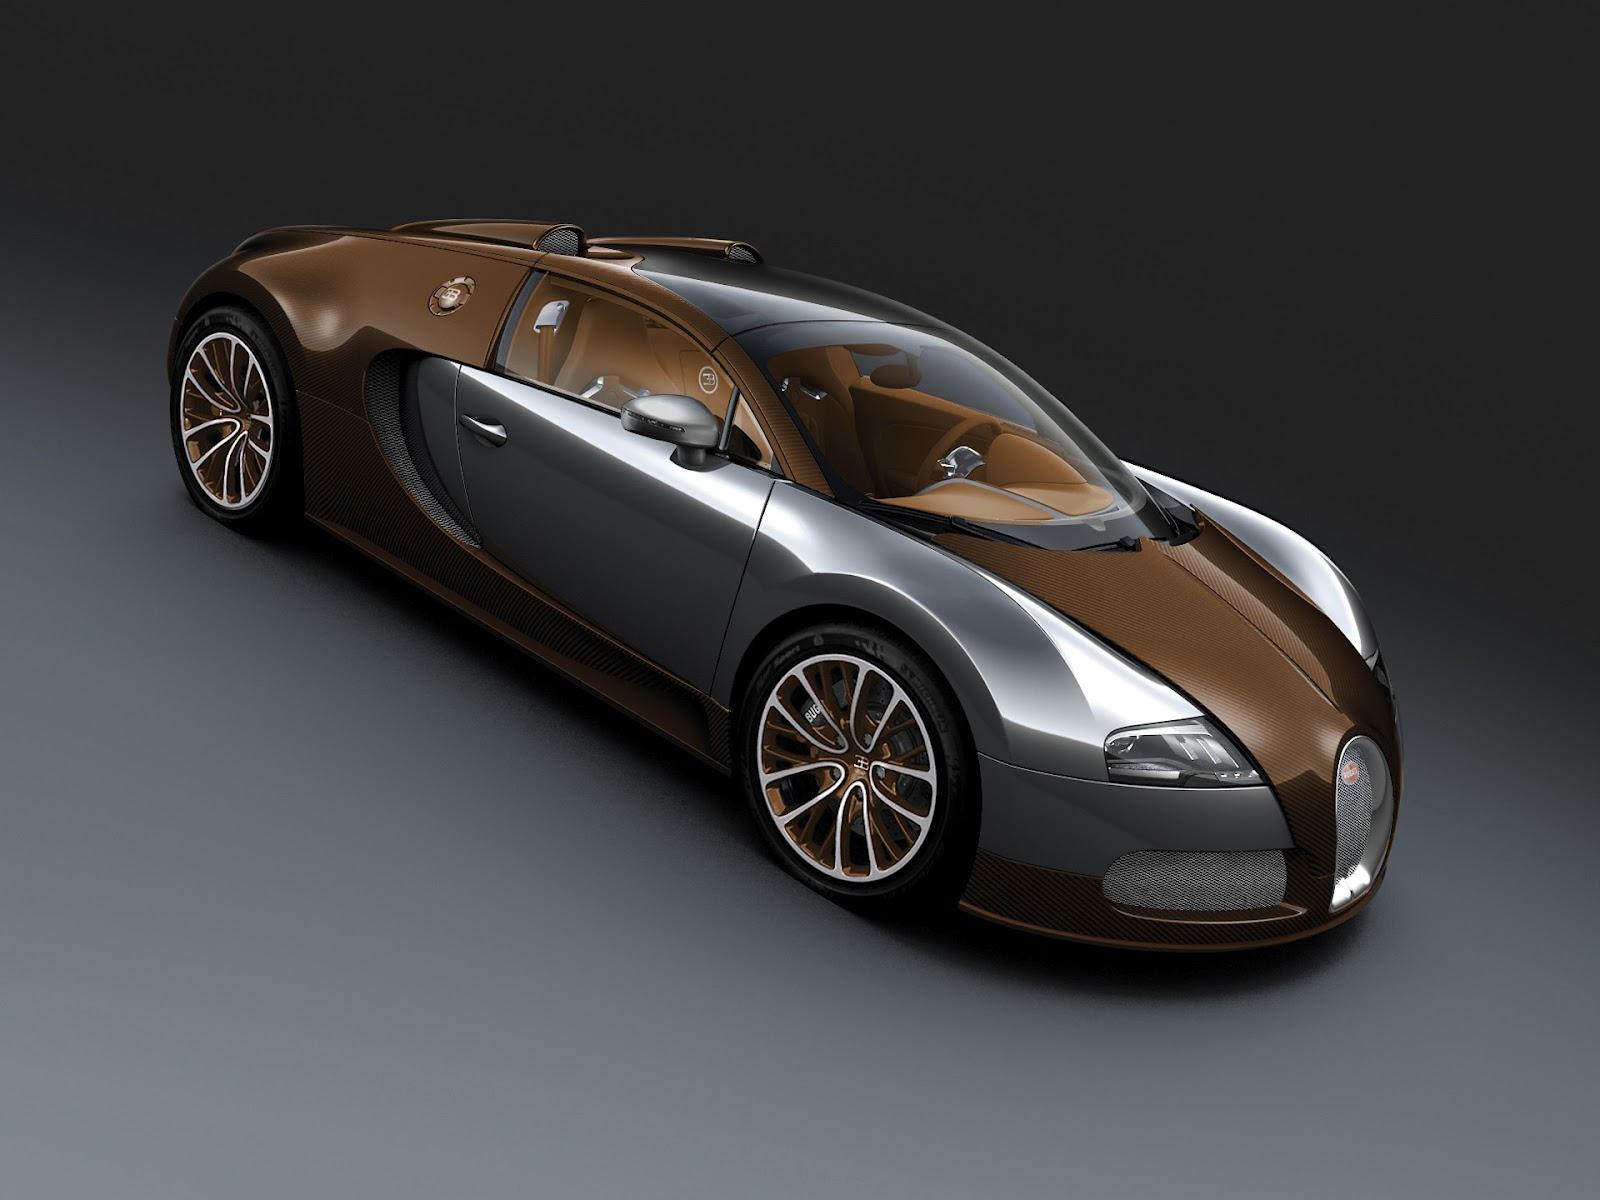 Bugatti+Veyron+Grand+Sport+Vitesse+Hd+Wallpapers+2012_6 Astounding Bugatti Veyron Grand Sport Vitesse Hd Cars Trend